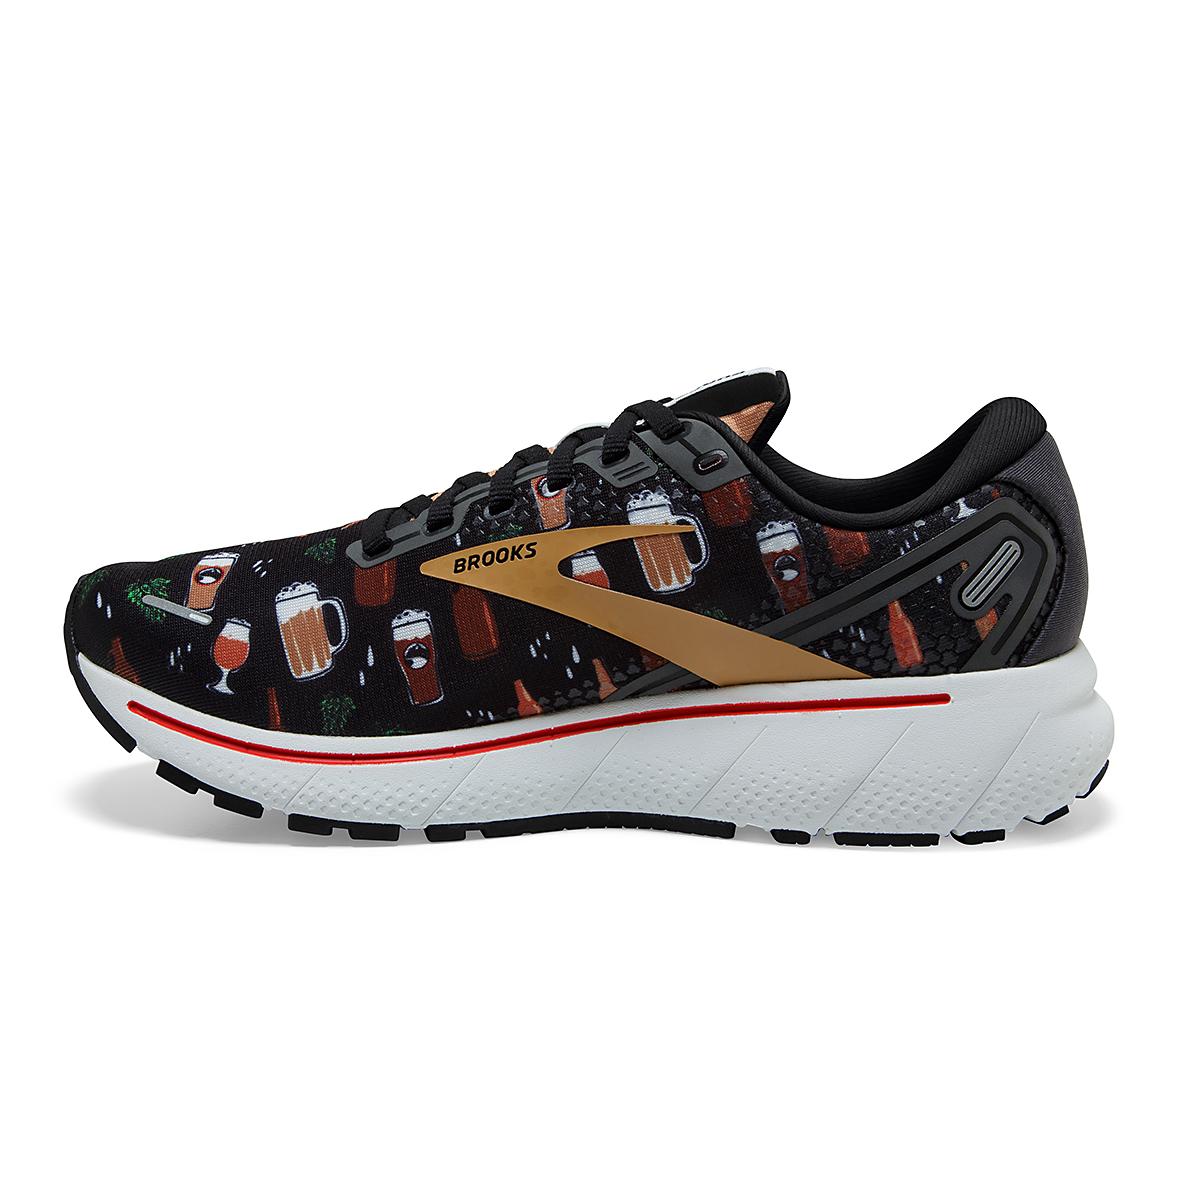 Women's Brooks Ghost 14 Running Shoe - Color: Run Hoppy - Size: 5 - Width: Regular, Run Hoppy, large, image 4